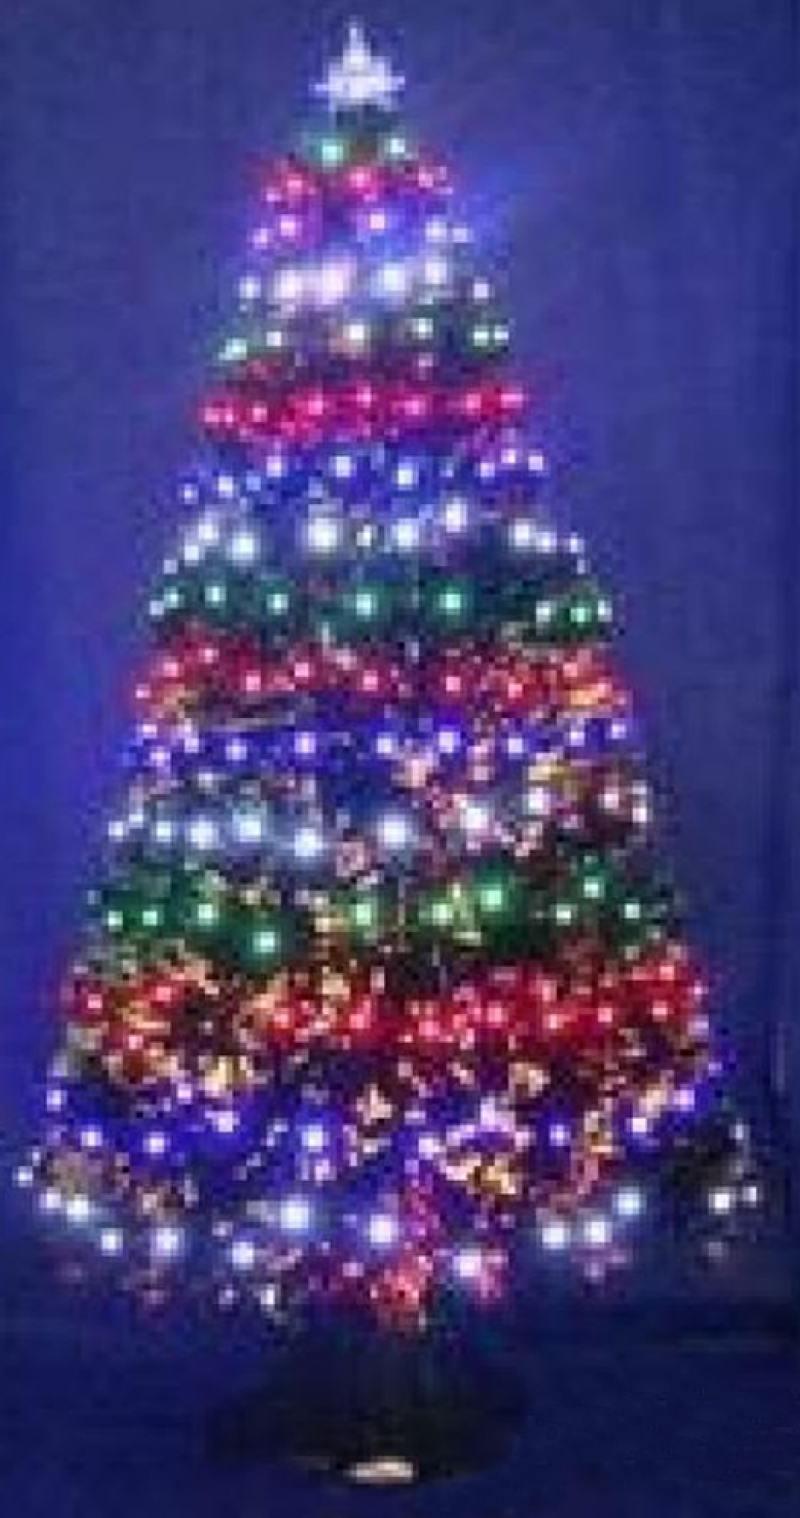 Ель Winter Wings N04127 90 см световод с разноцветными супер-яркими лампами, 100 ламп LED,100 веток,